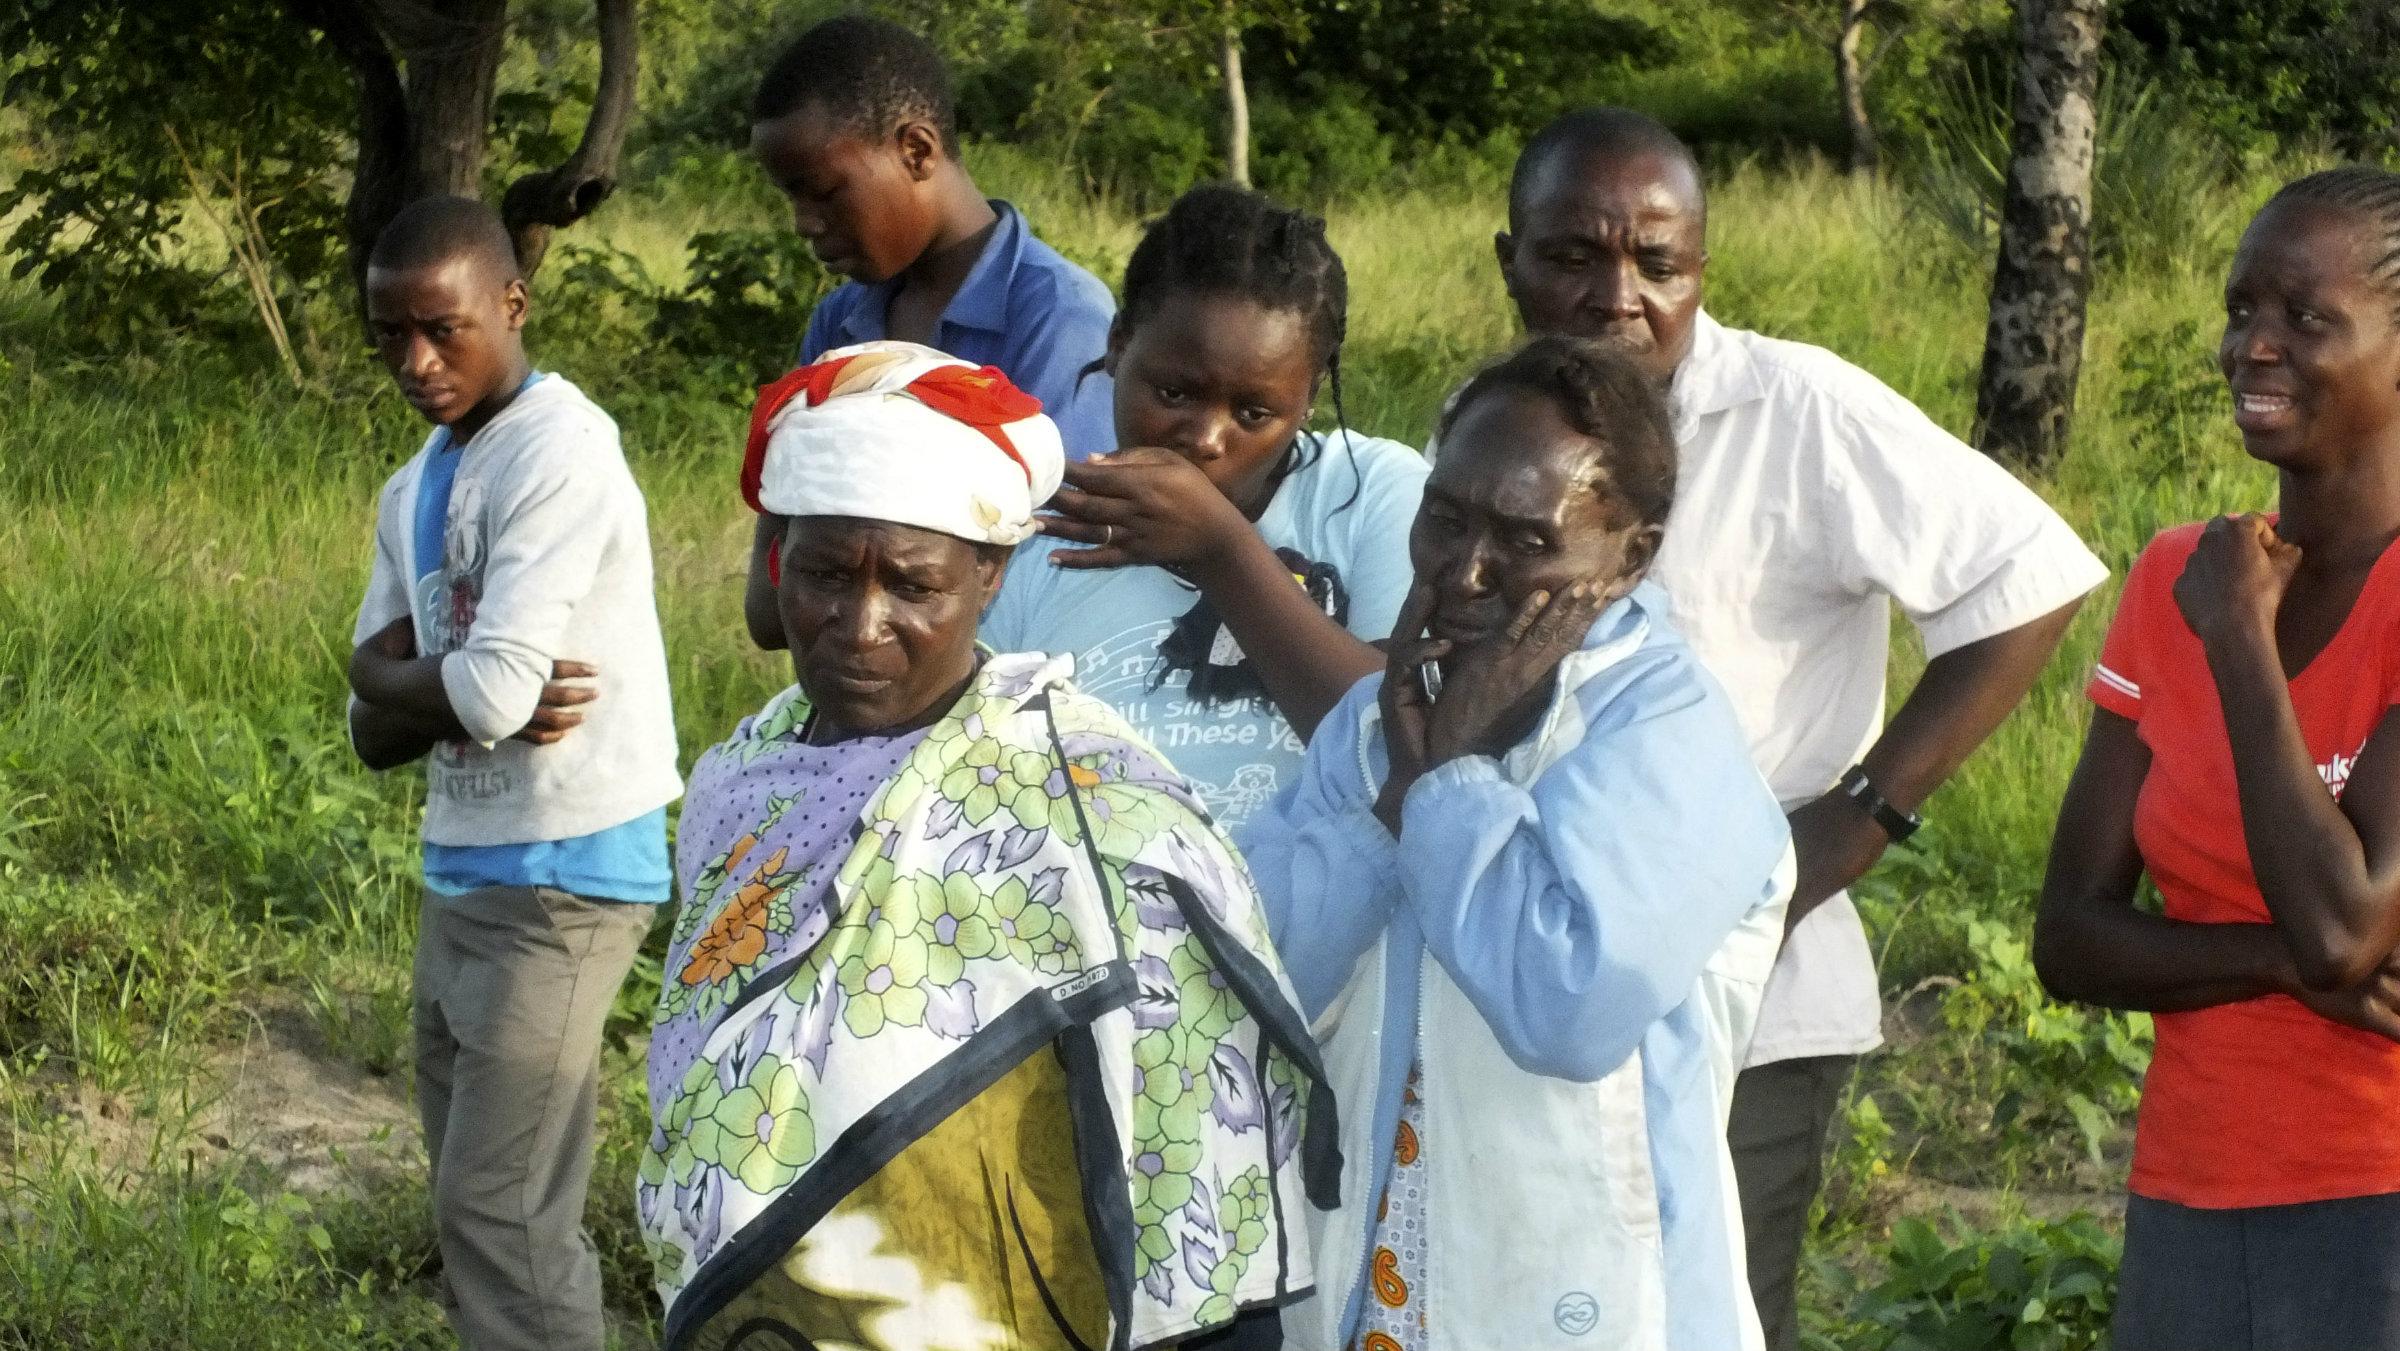 In Hindi village, near Kenya's coastal town of Lamu, where some 30 people were killed July 6, 2014, by al-Shabab.